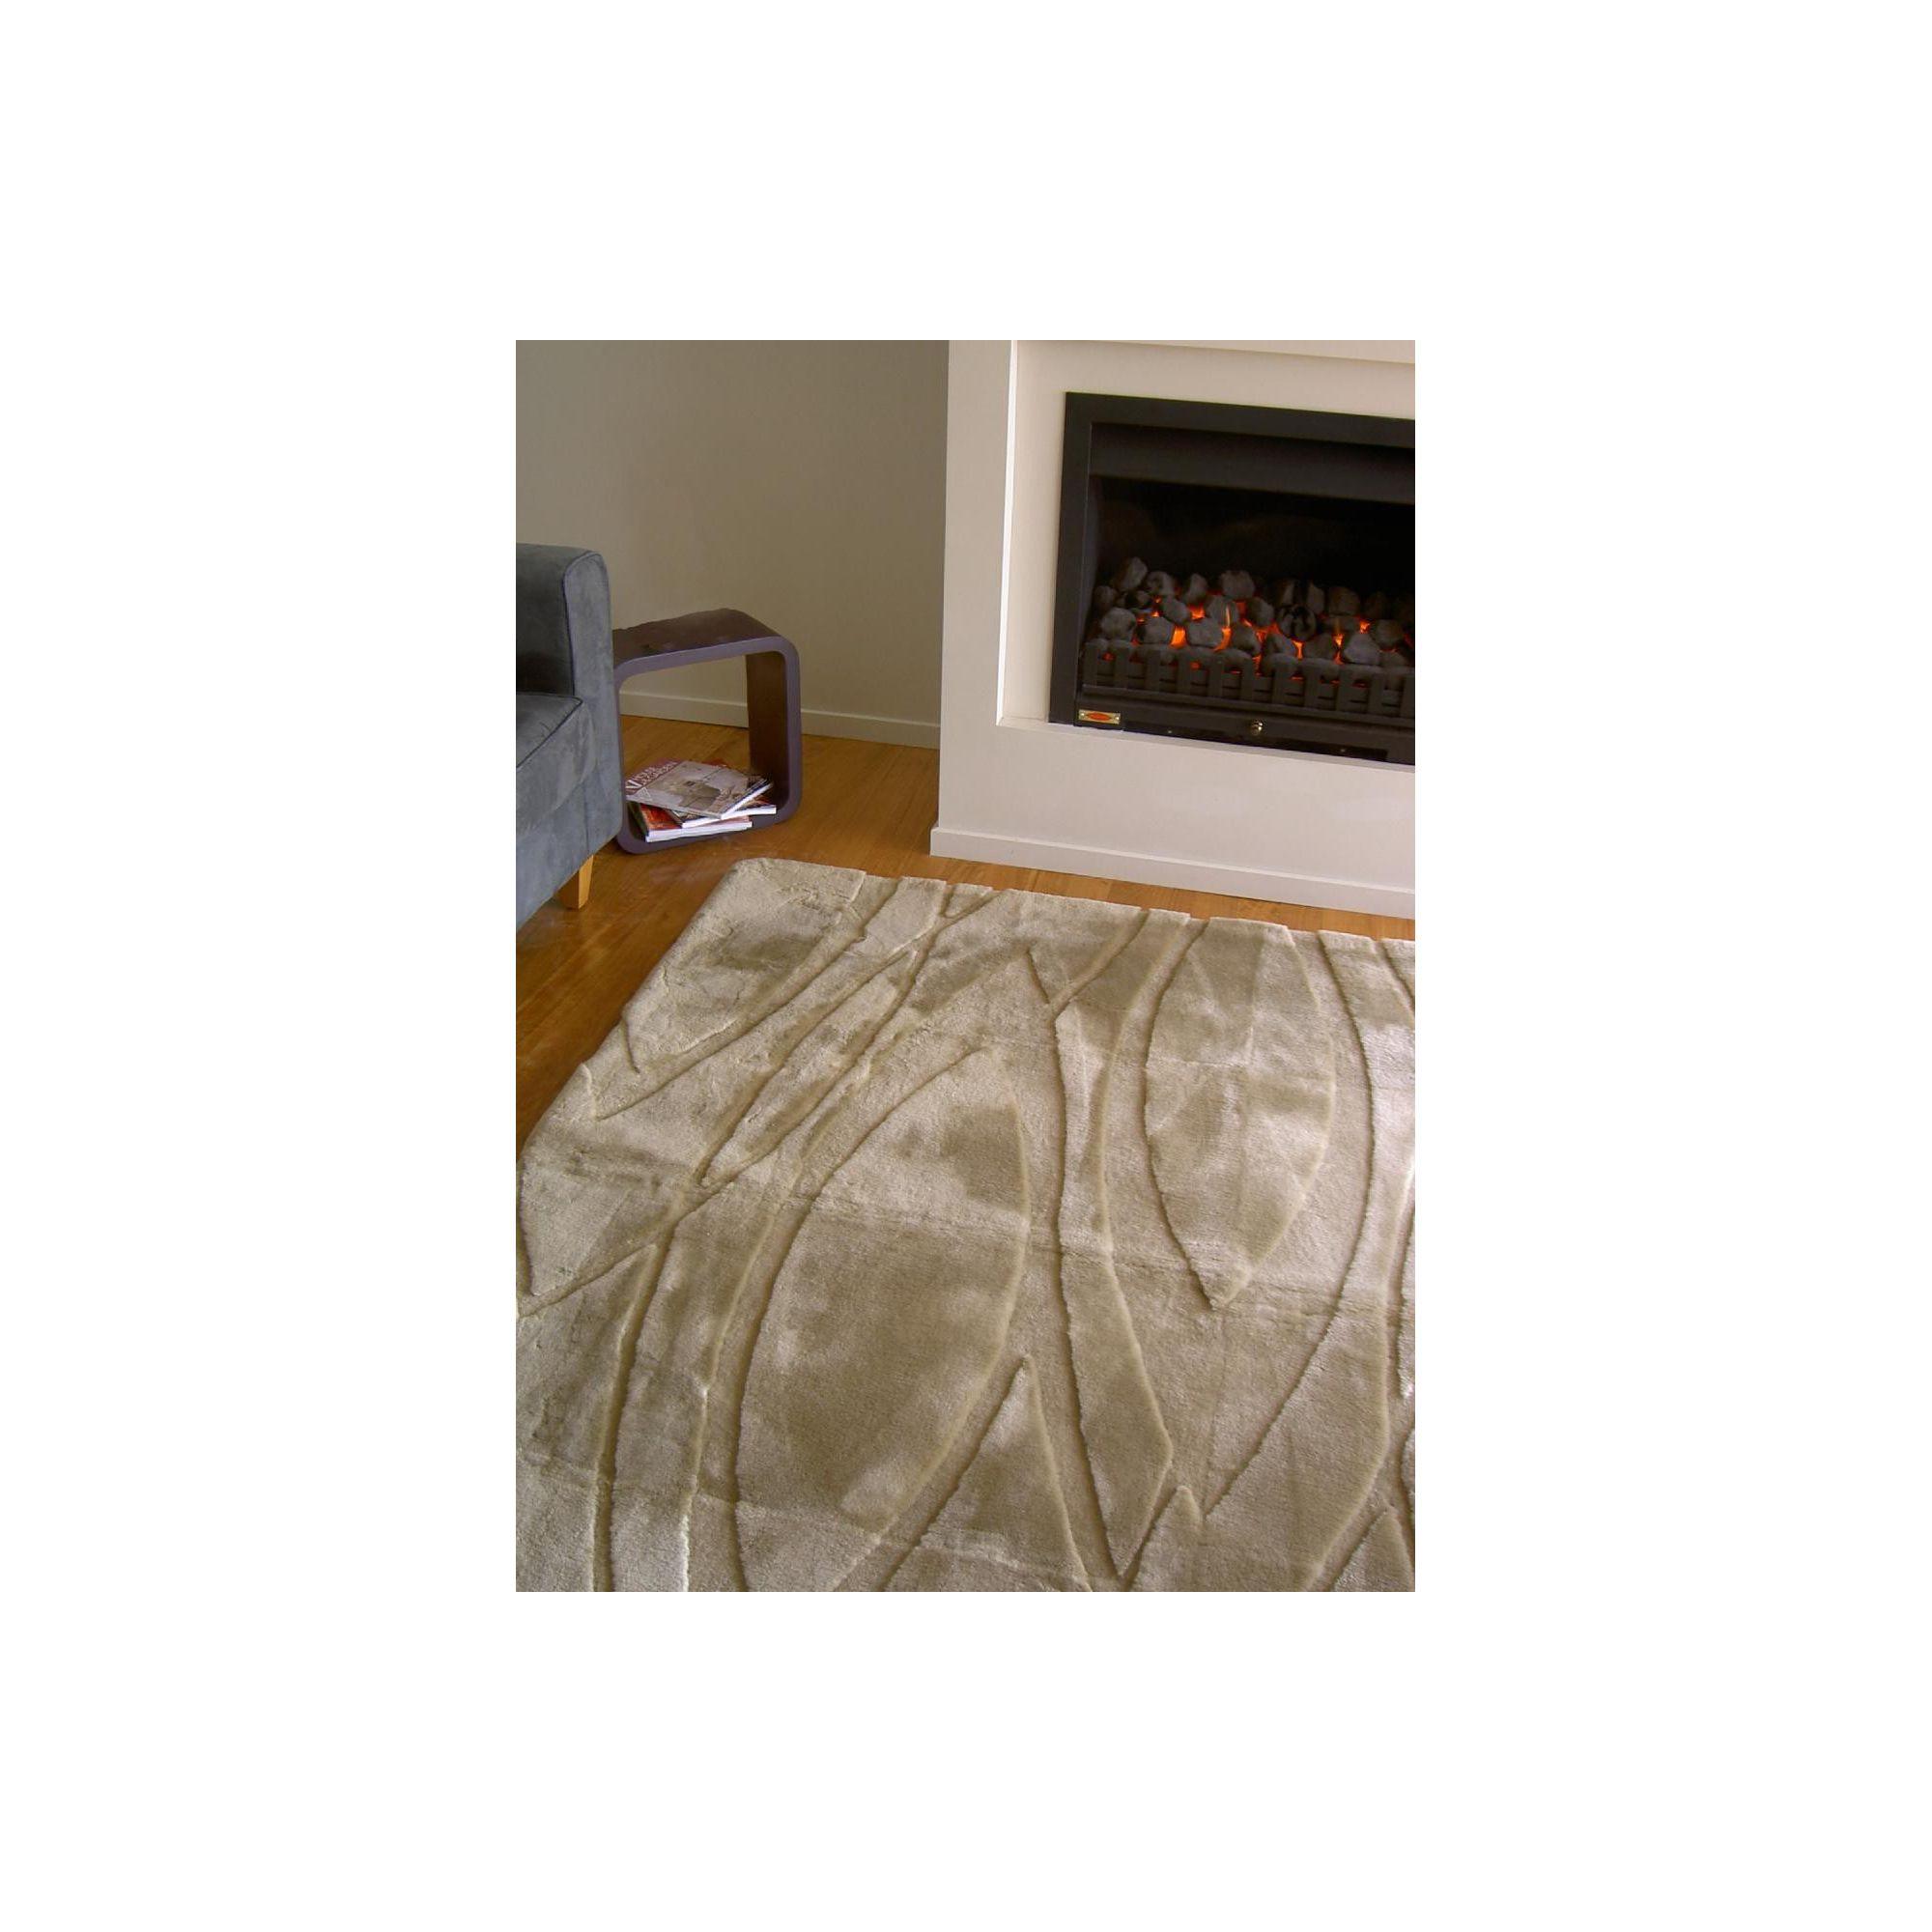 Bowron Sheepskin Shortwool Design Curves Rug - 300cm H x 200cm W x 1cm D at Tescos Direct